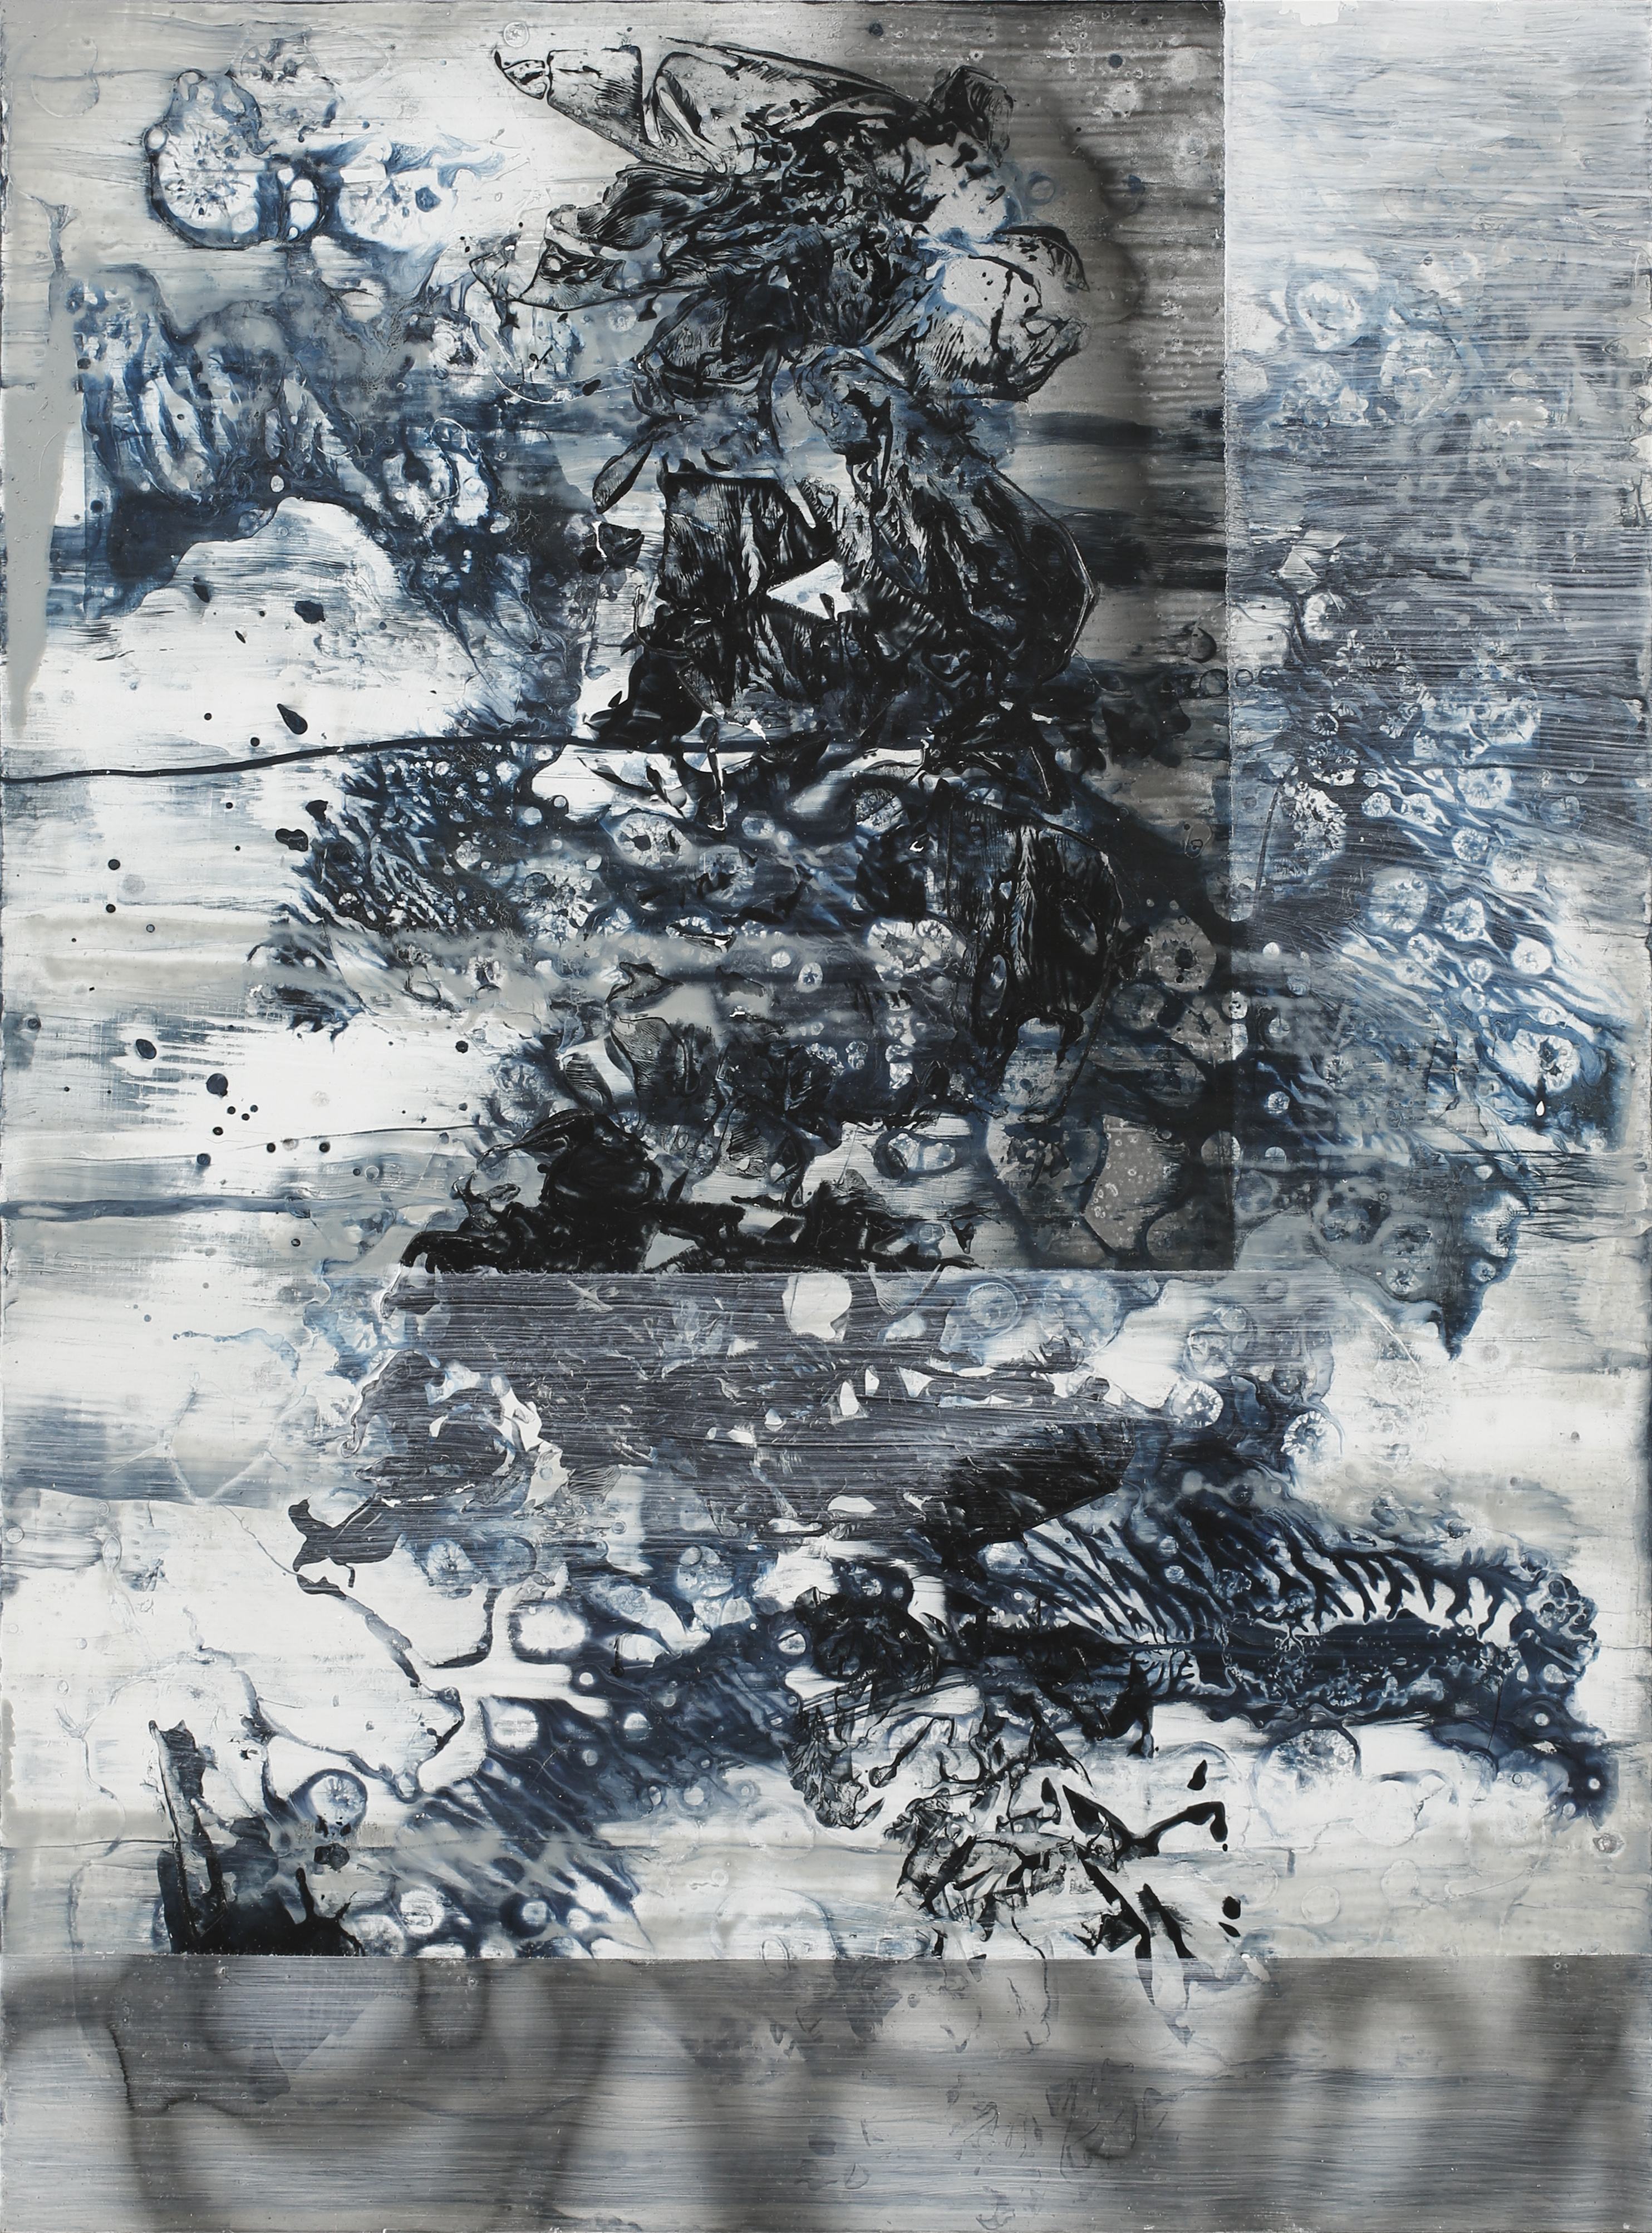 Martin Formgren, Illuminations IV, 2017, acrylic, ink and emulsion on aluminium